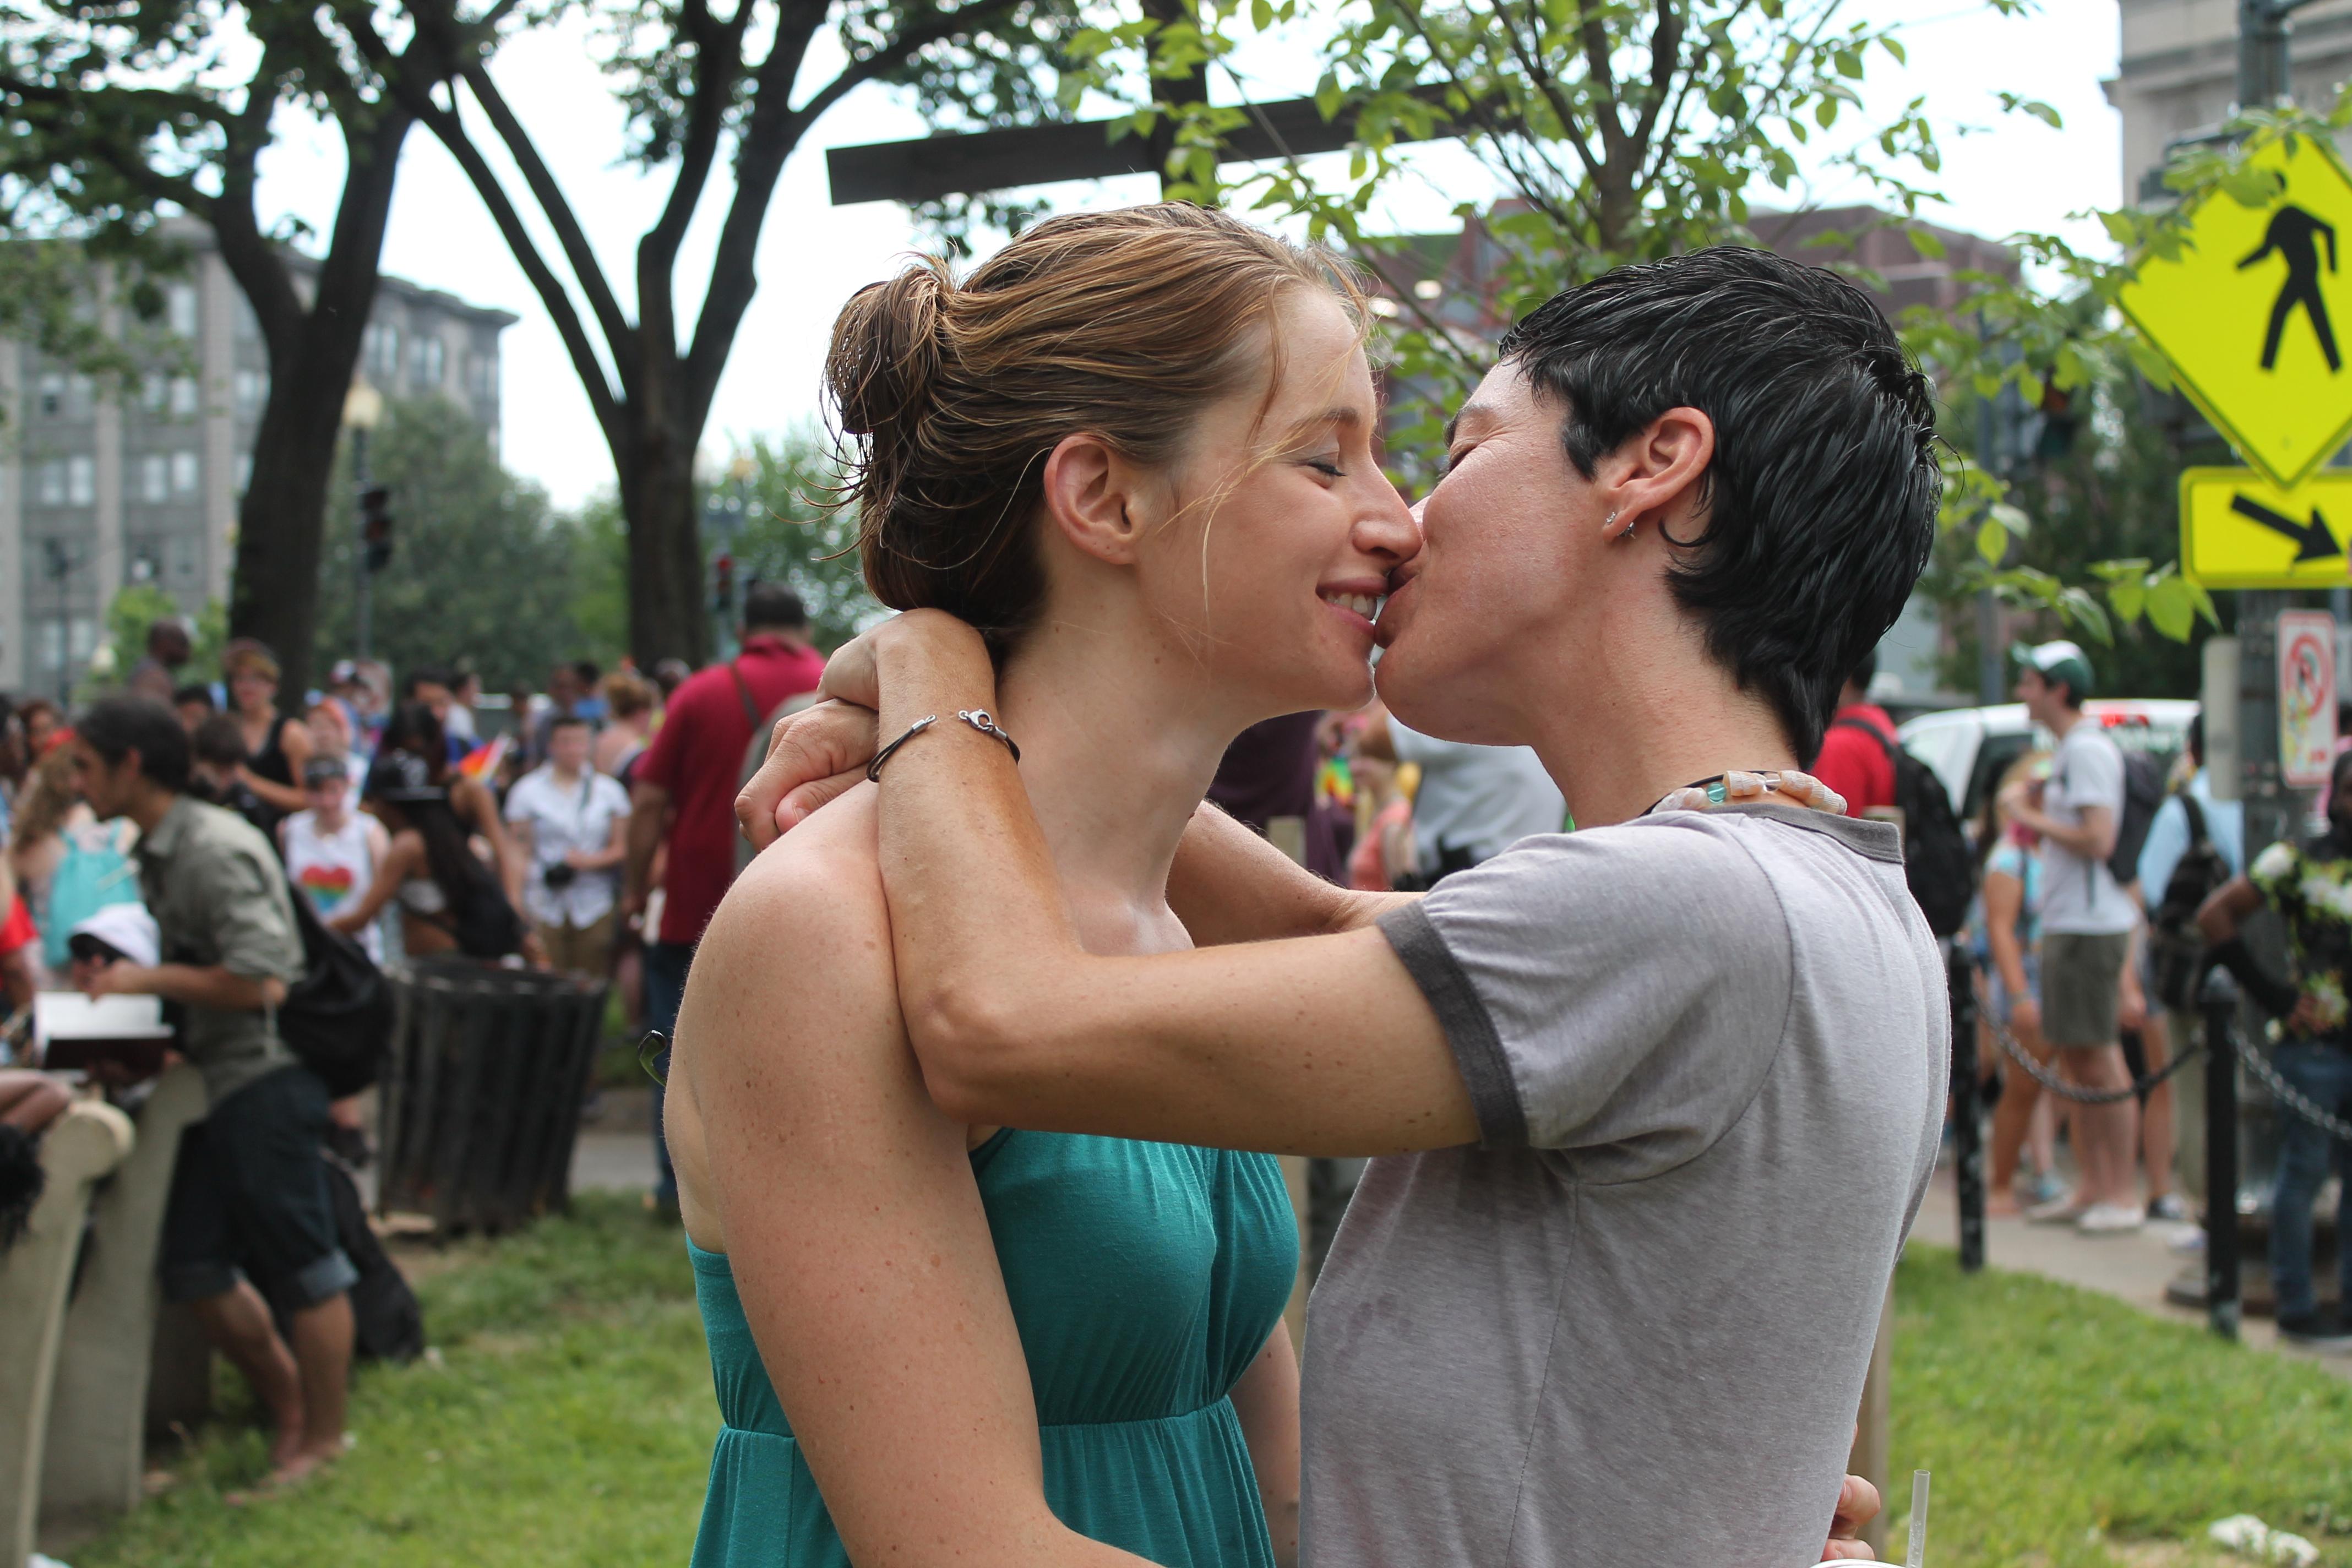 gay velocità dating Chicago e, du matchmaking cs andare